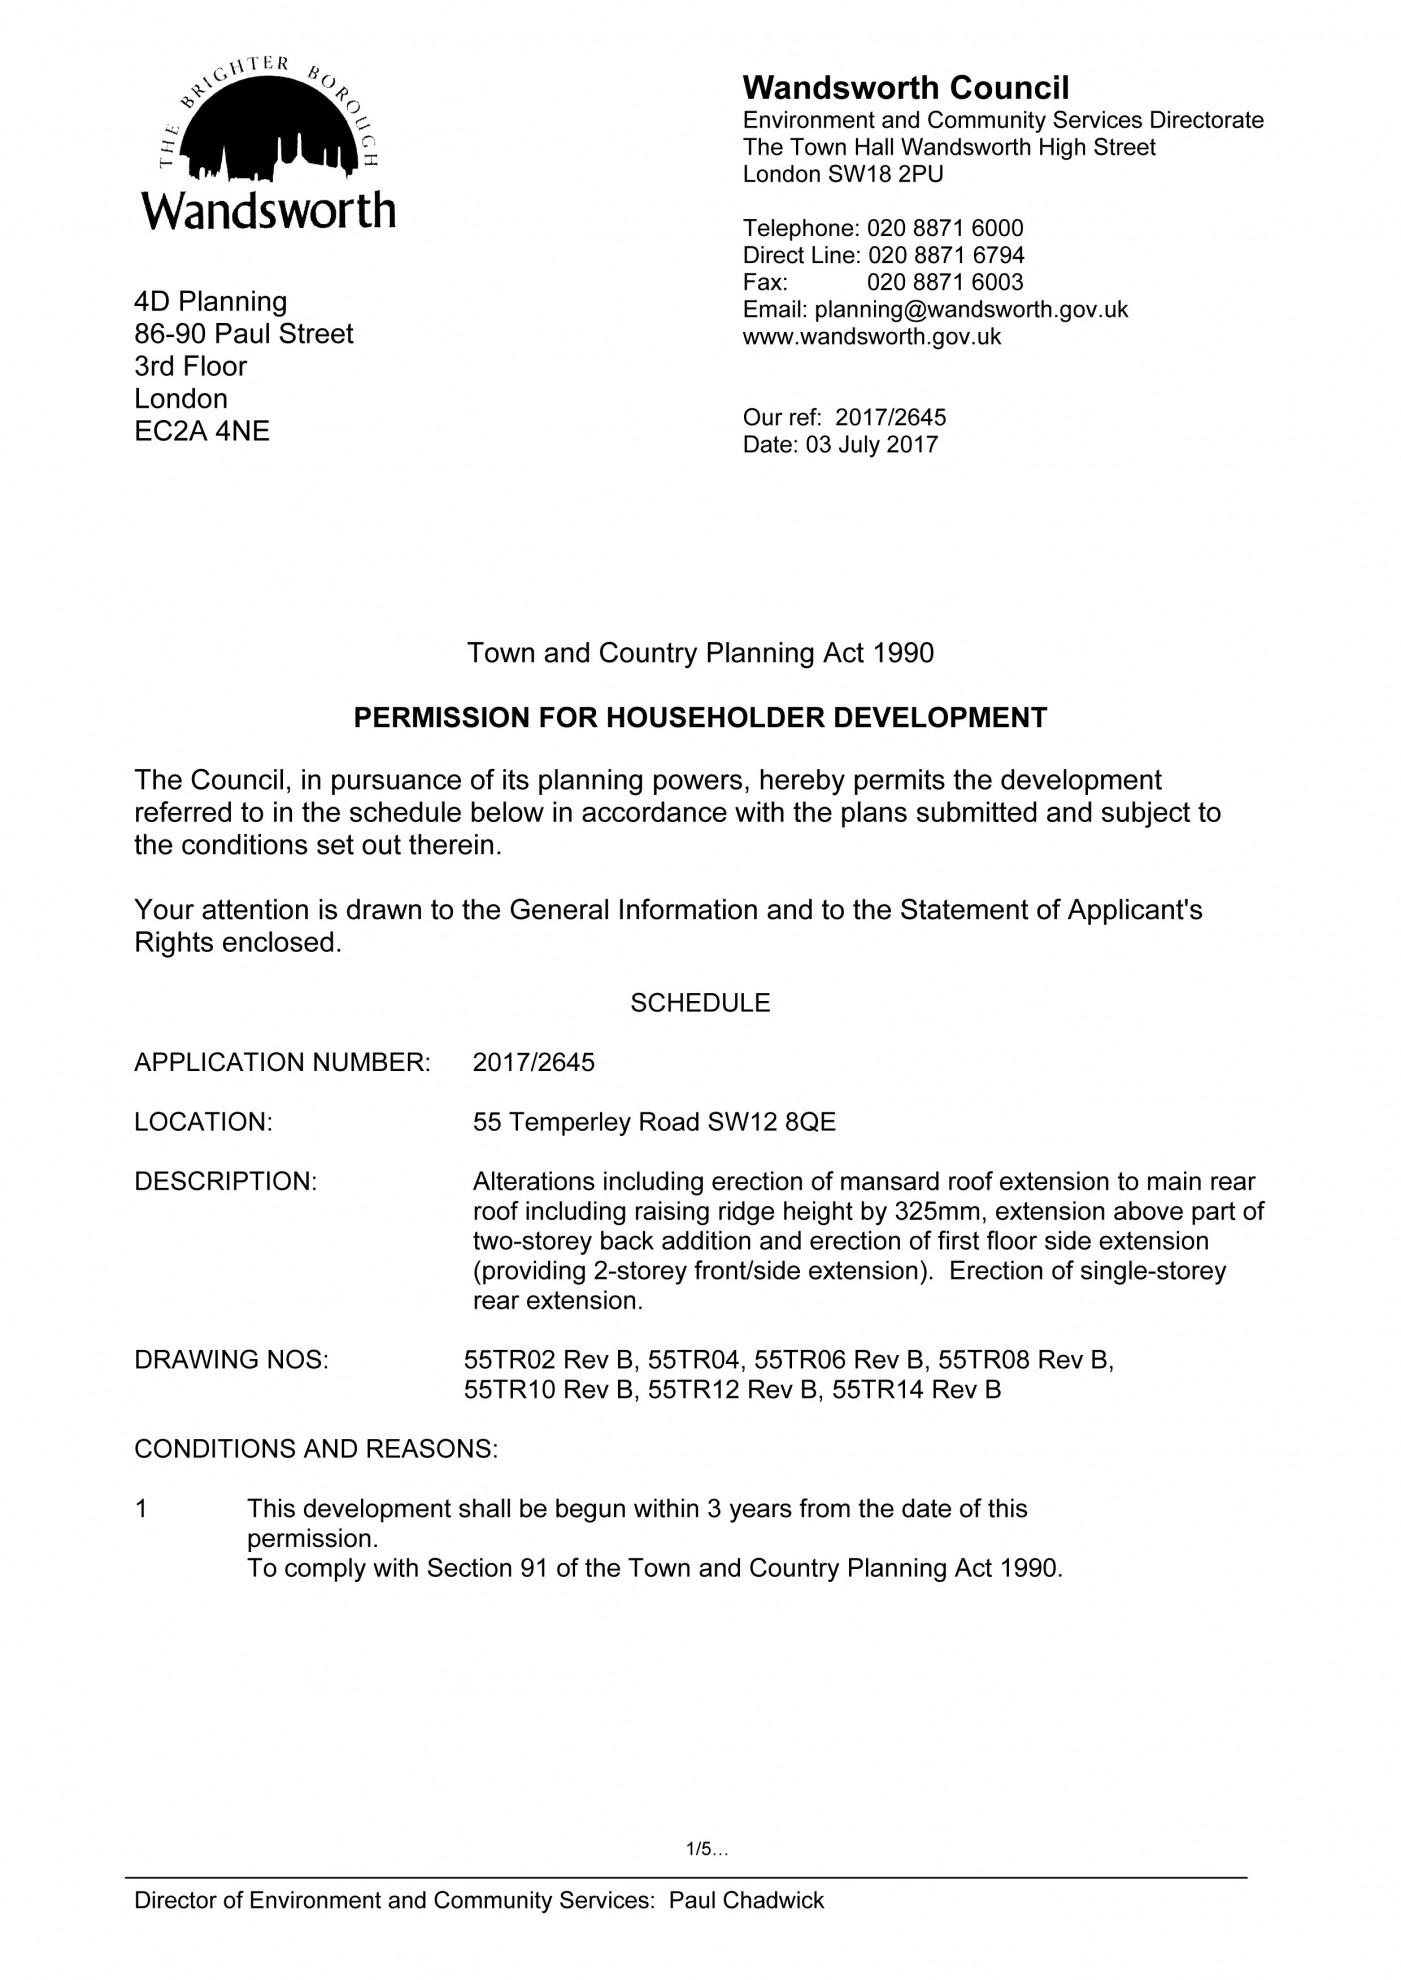 decision notice -  Wandsworth